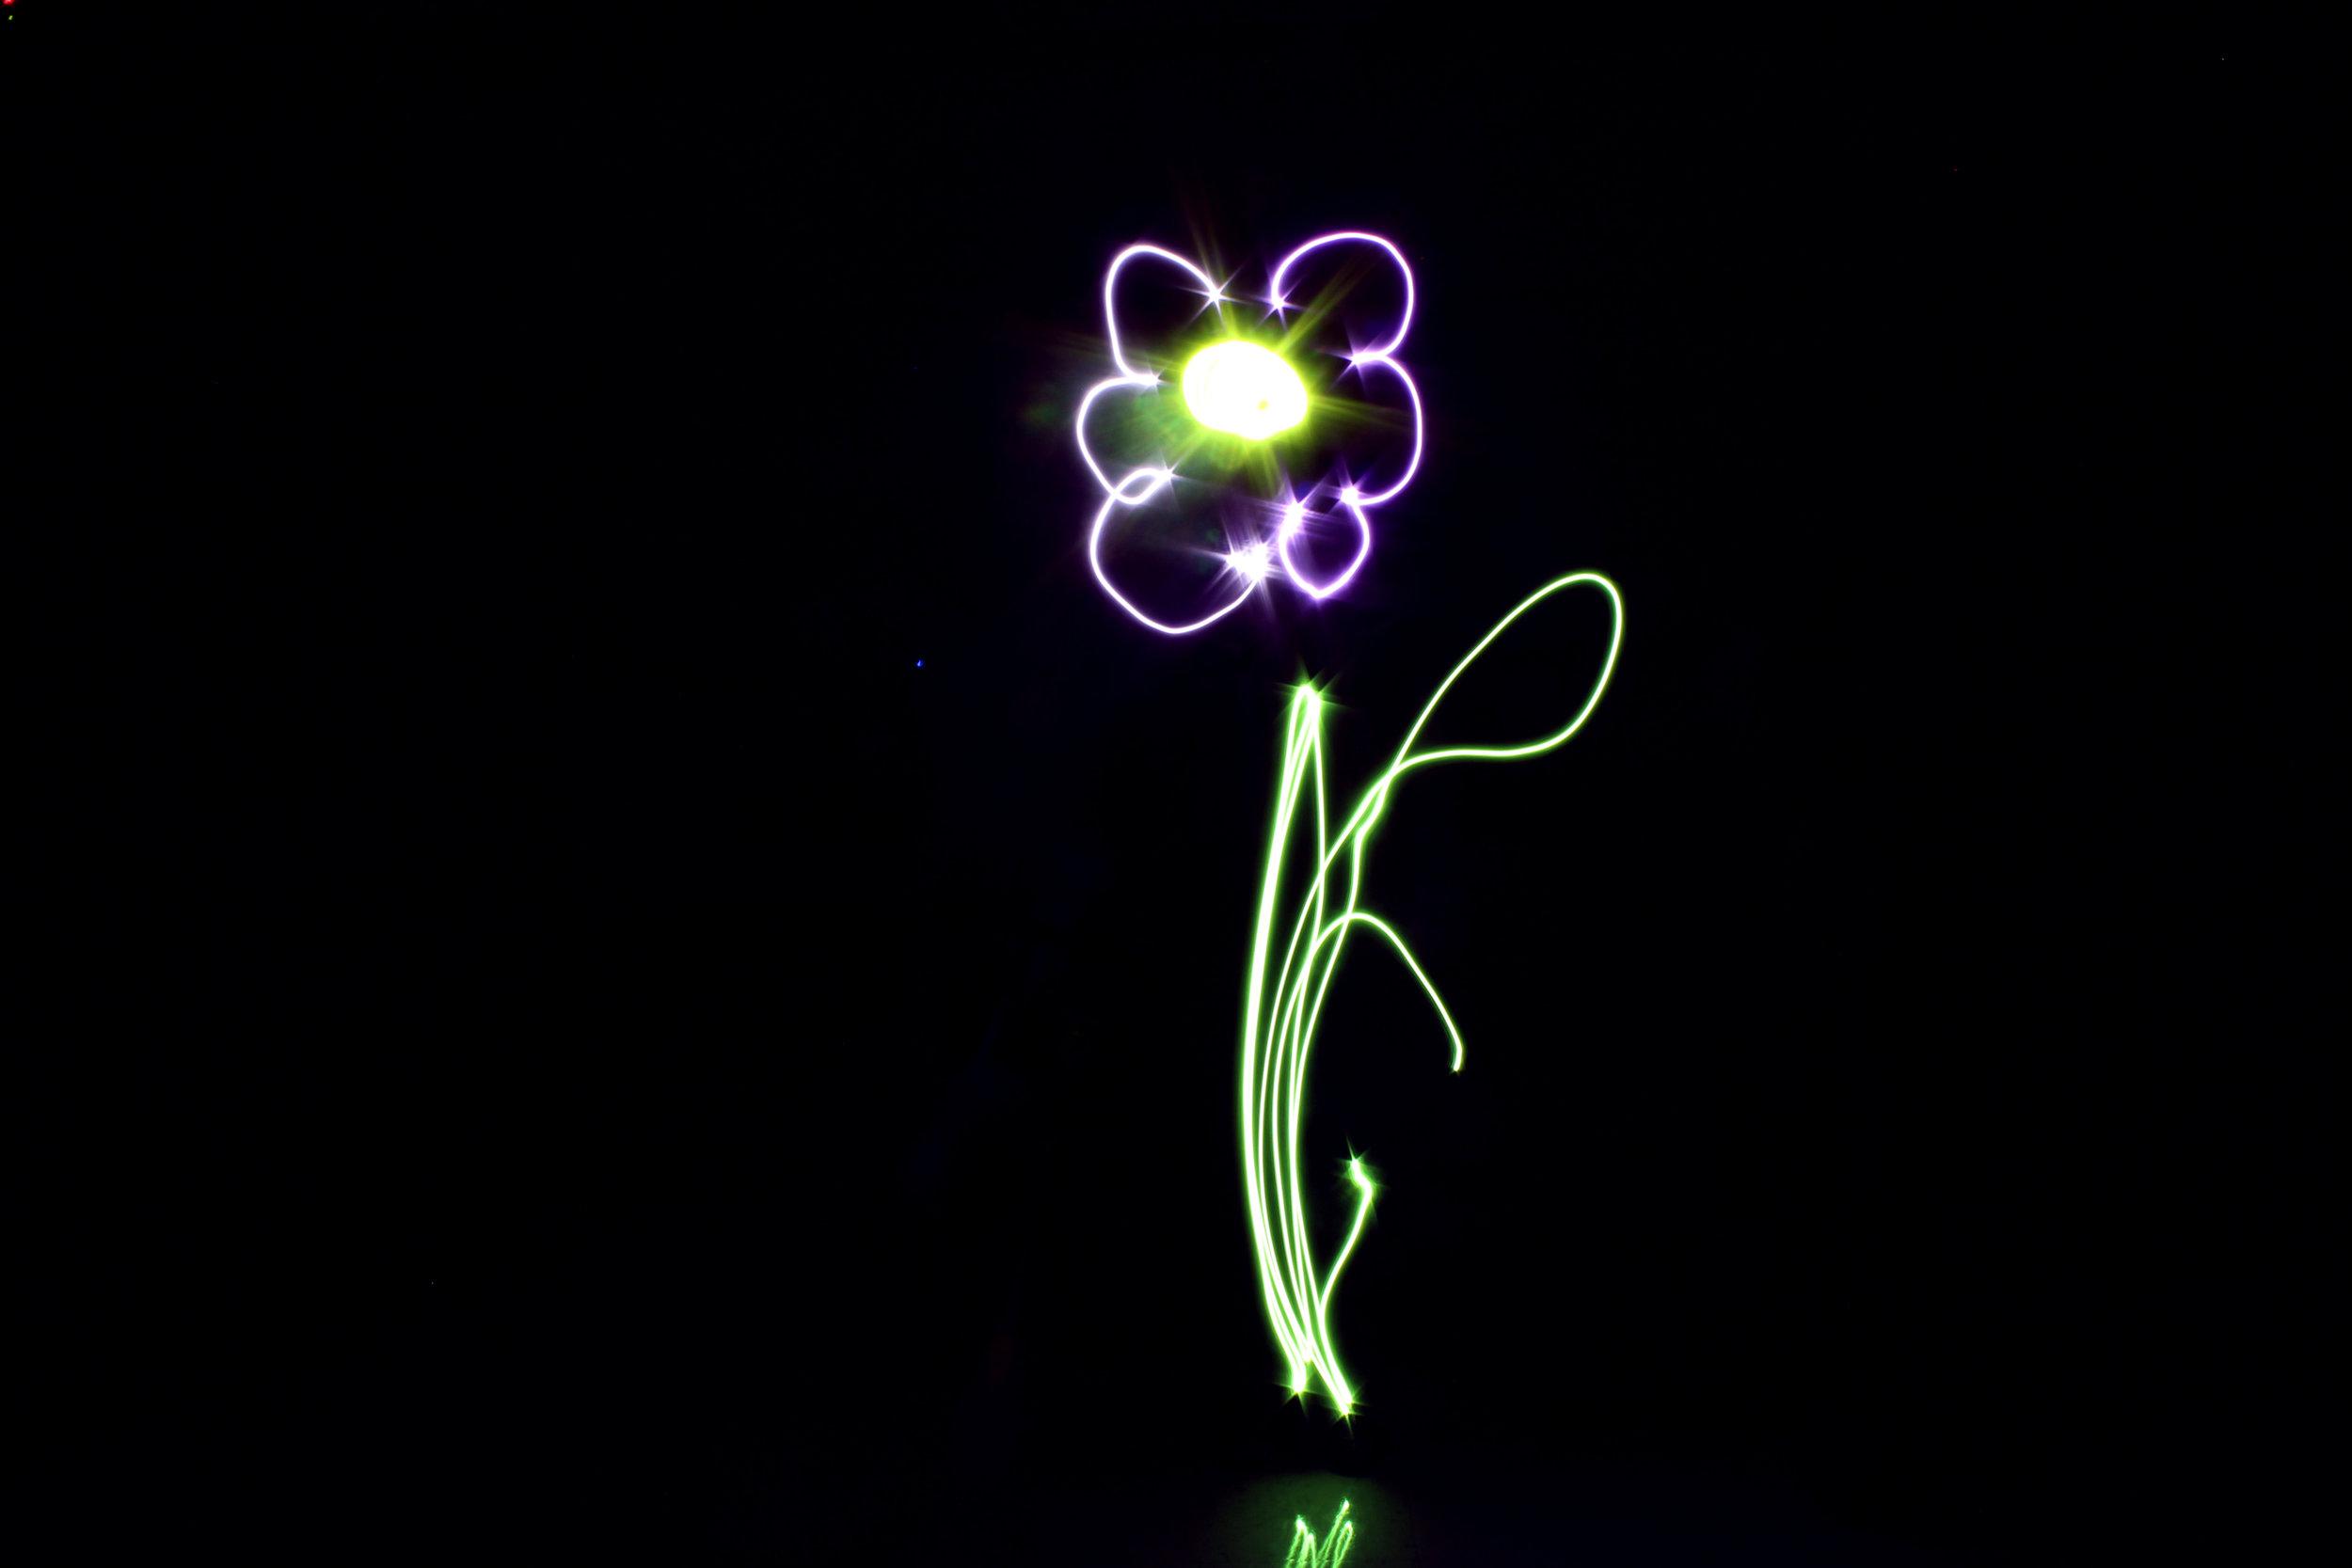 preethi melissa alex al paiting with light.jpg